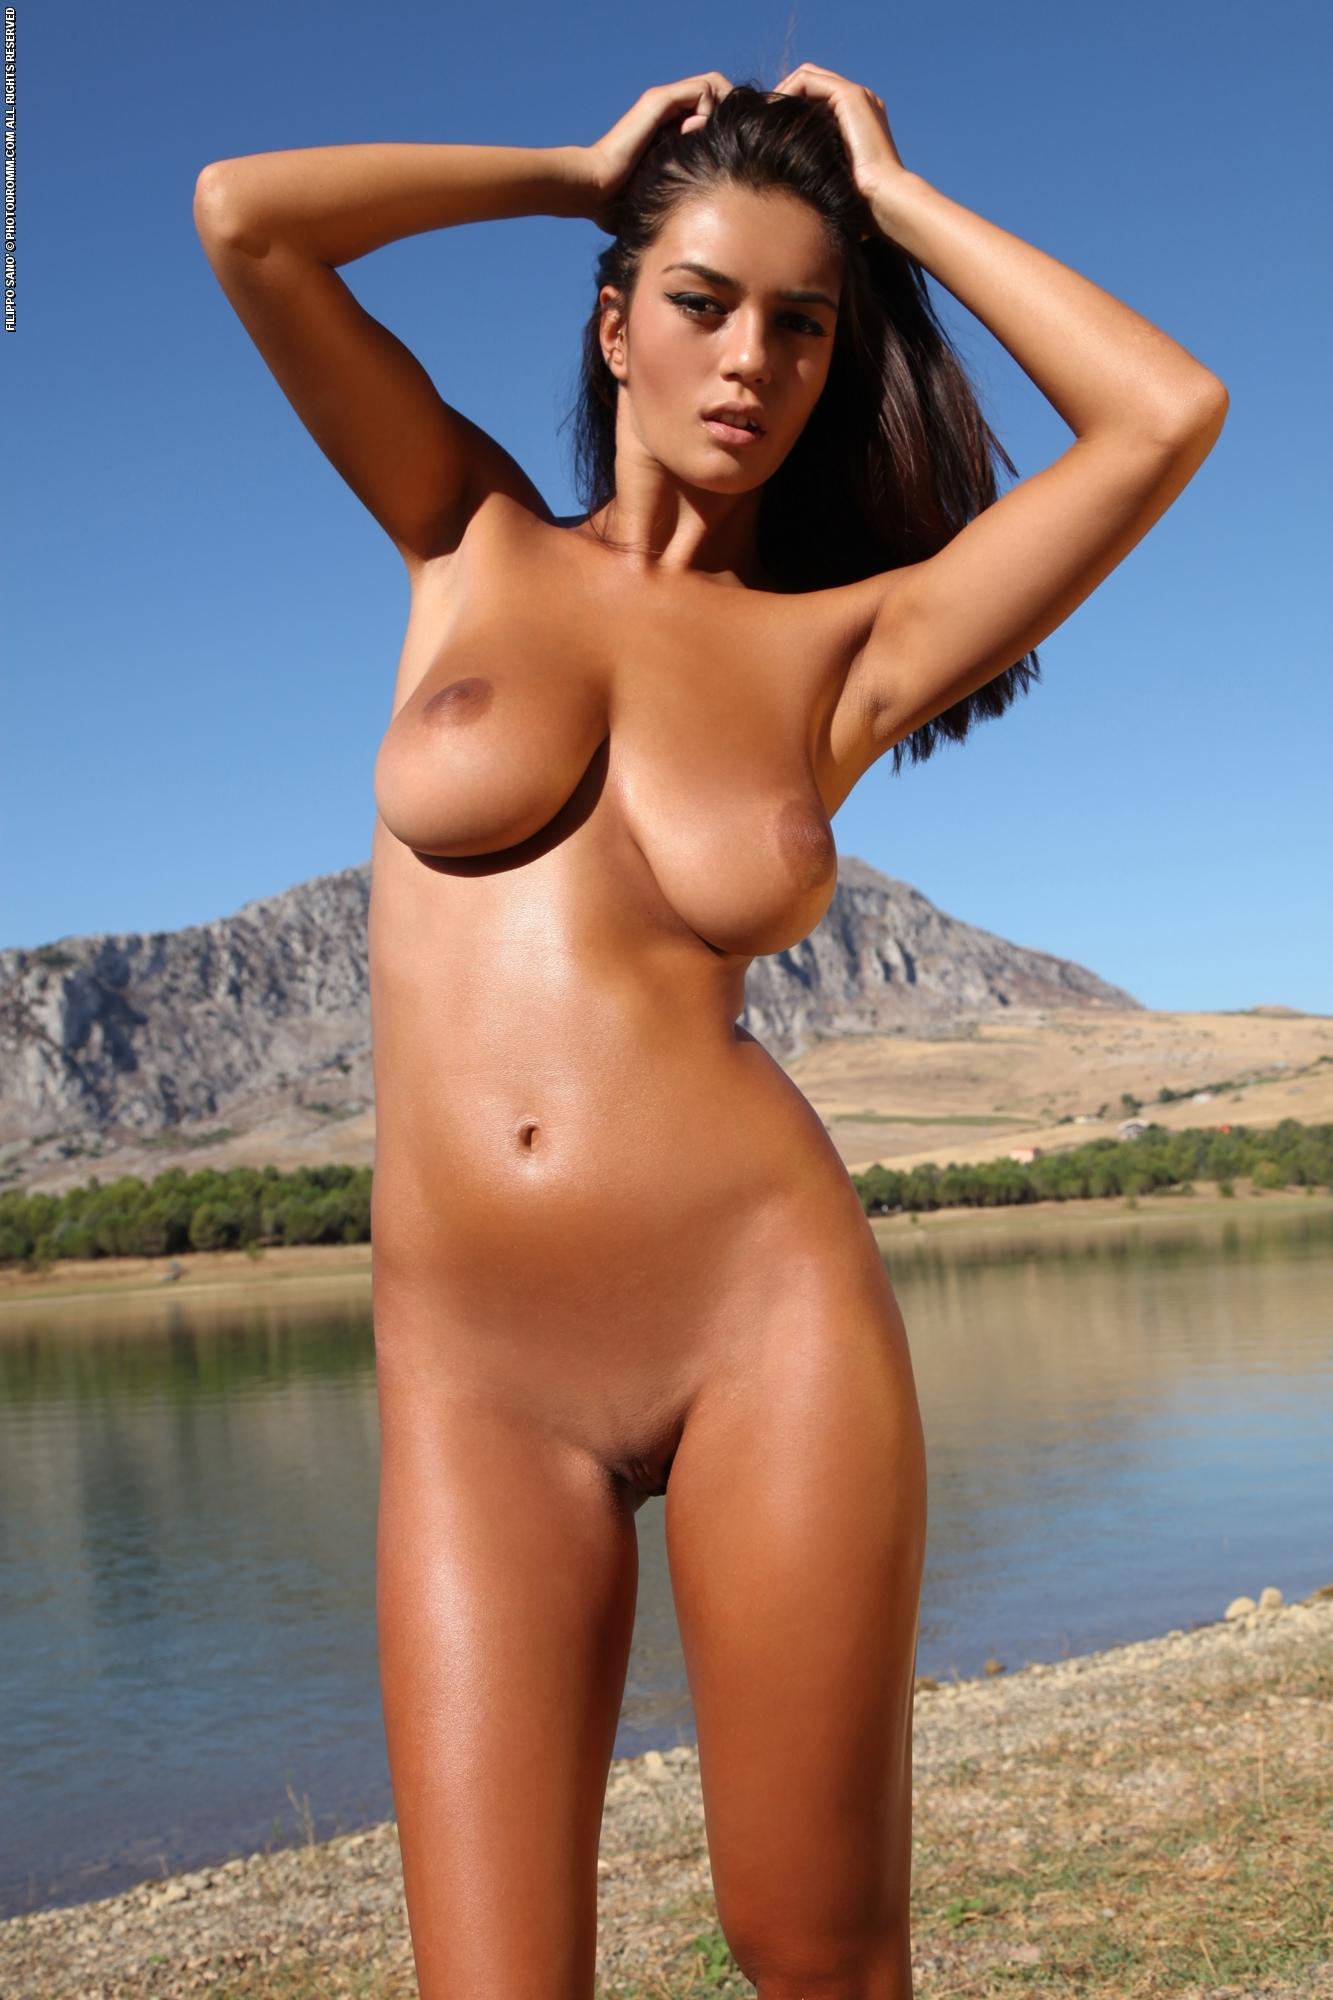 Savanas nude ela Cherry Nudes